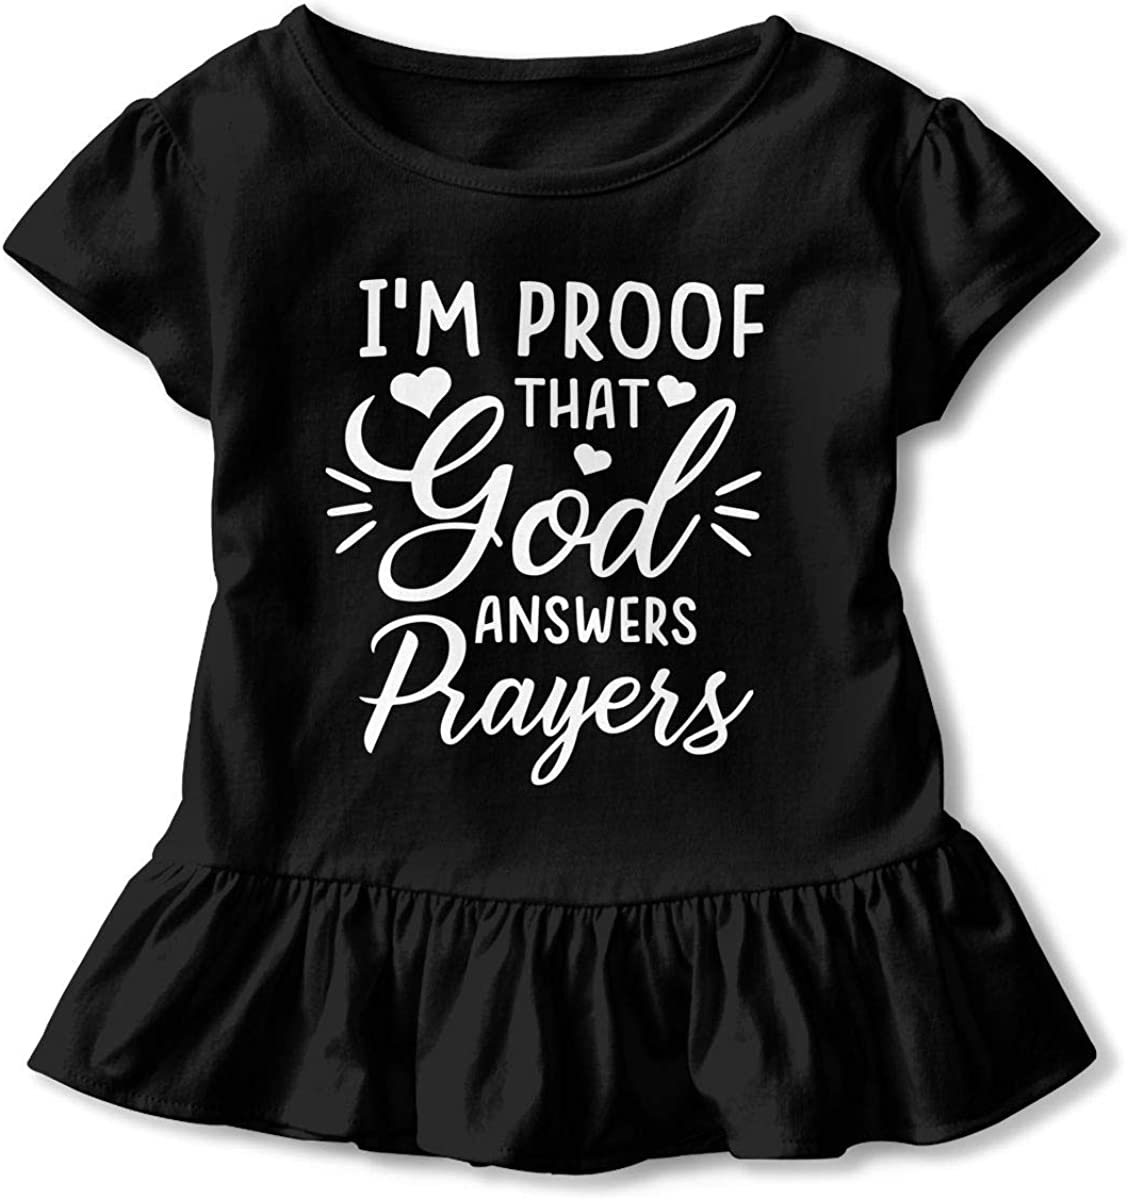 Proof That God Answers Prayers Toddler Girls T Shirt Kids Cotton Short Sleeve Ruffle Tee